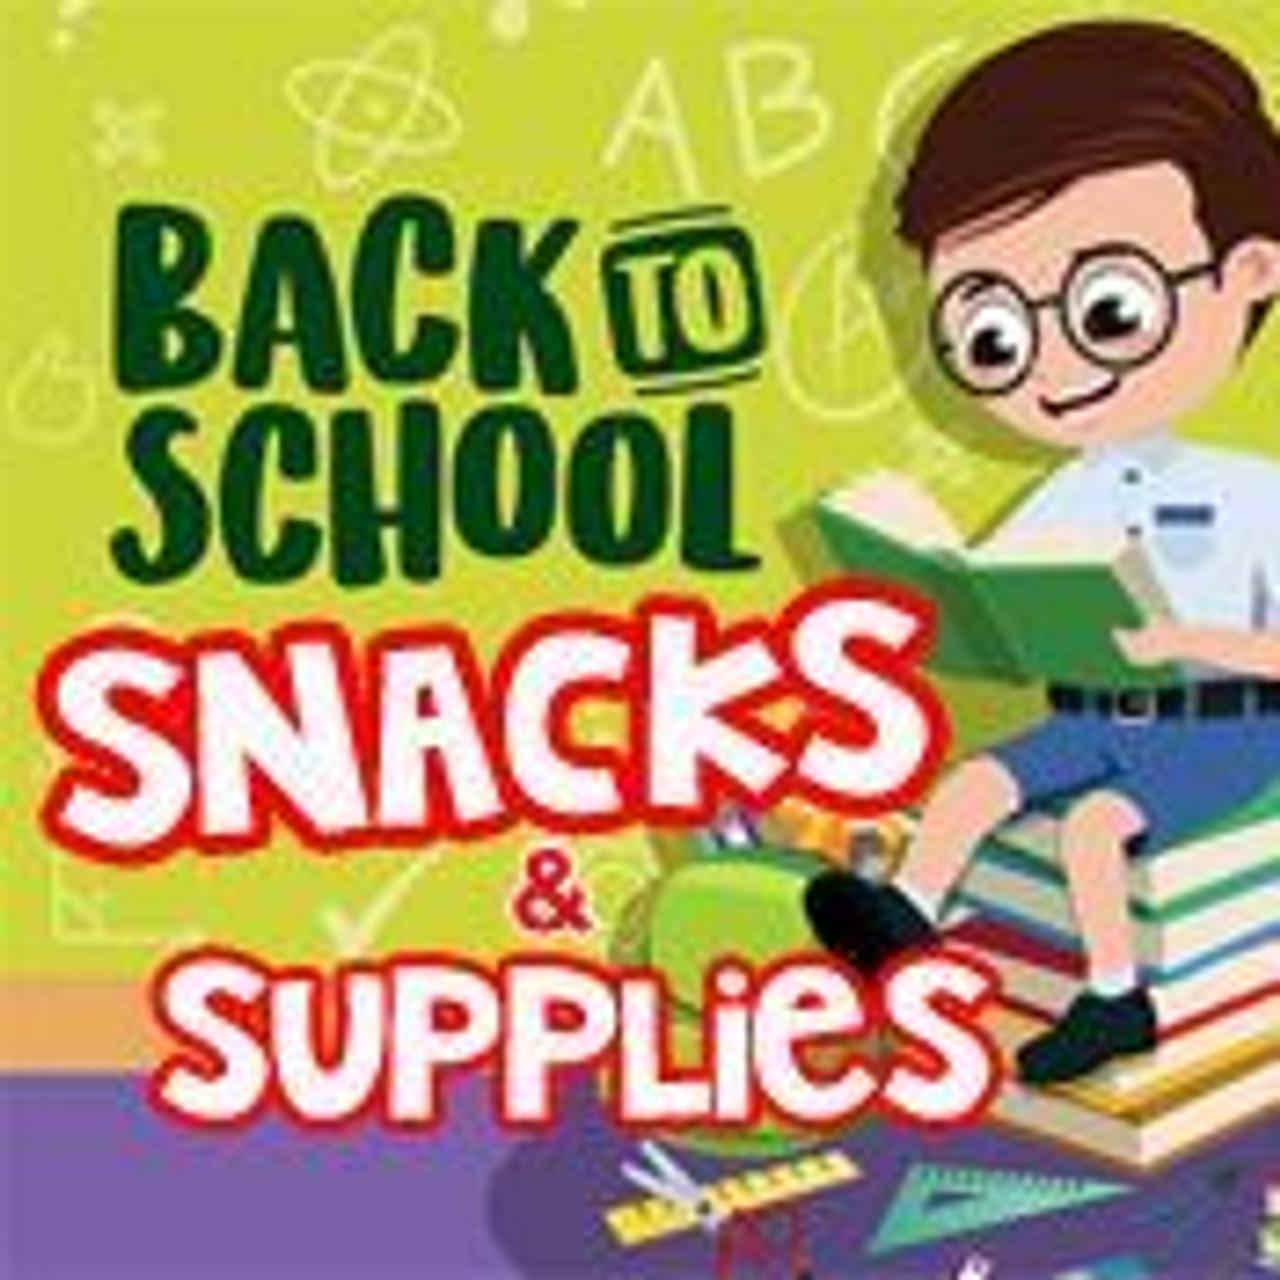 School Candy & Snacks